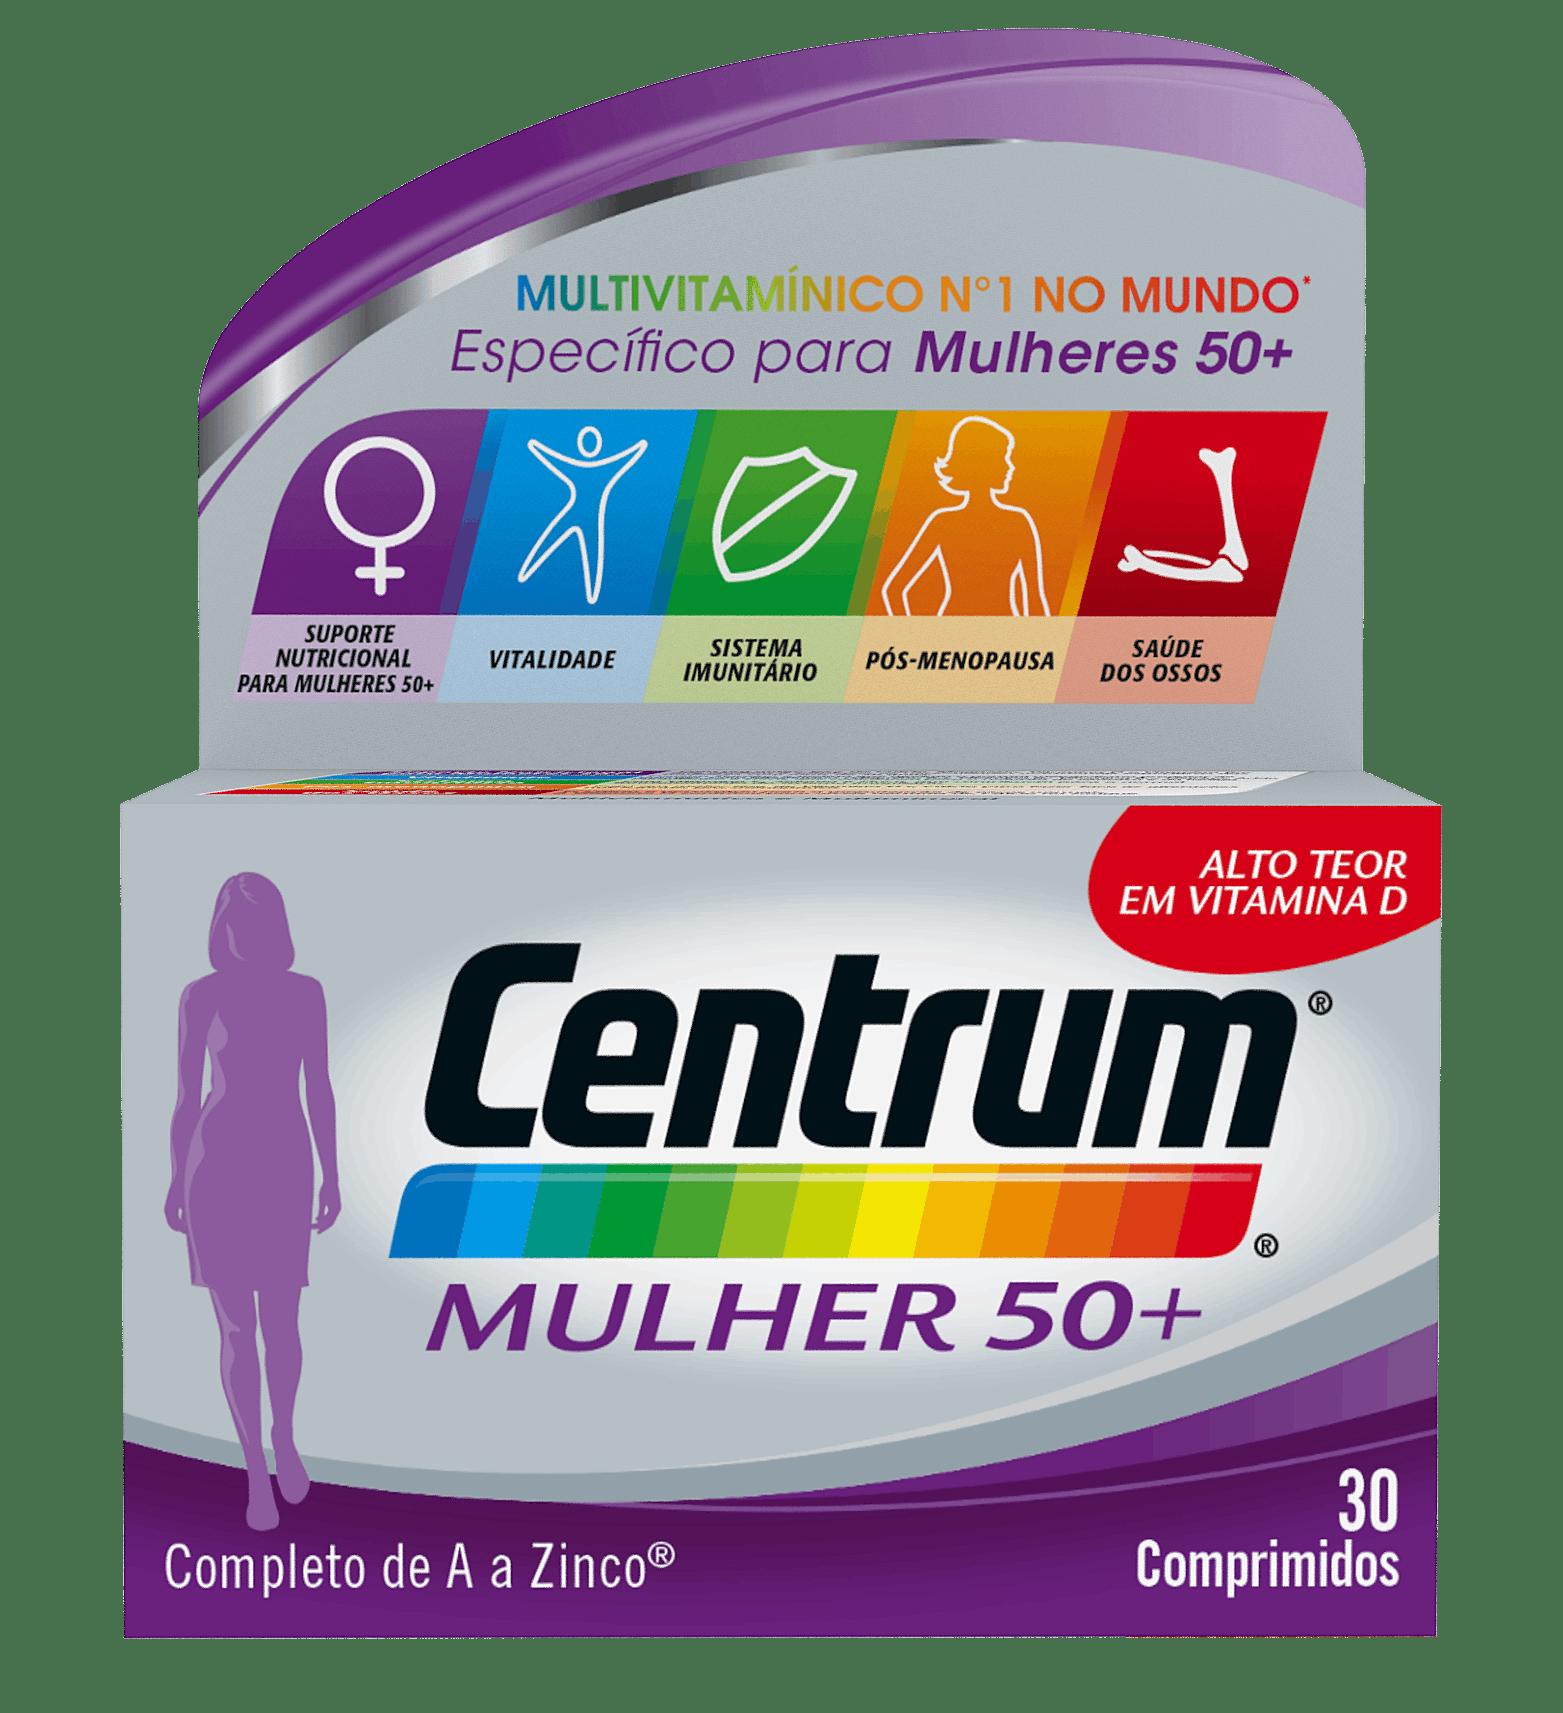 Centrum Mulher 50+